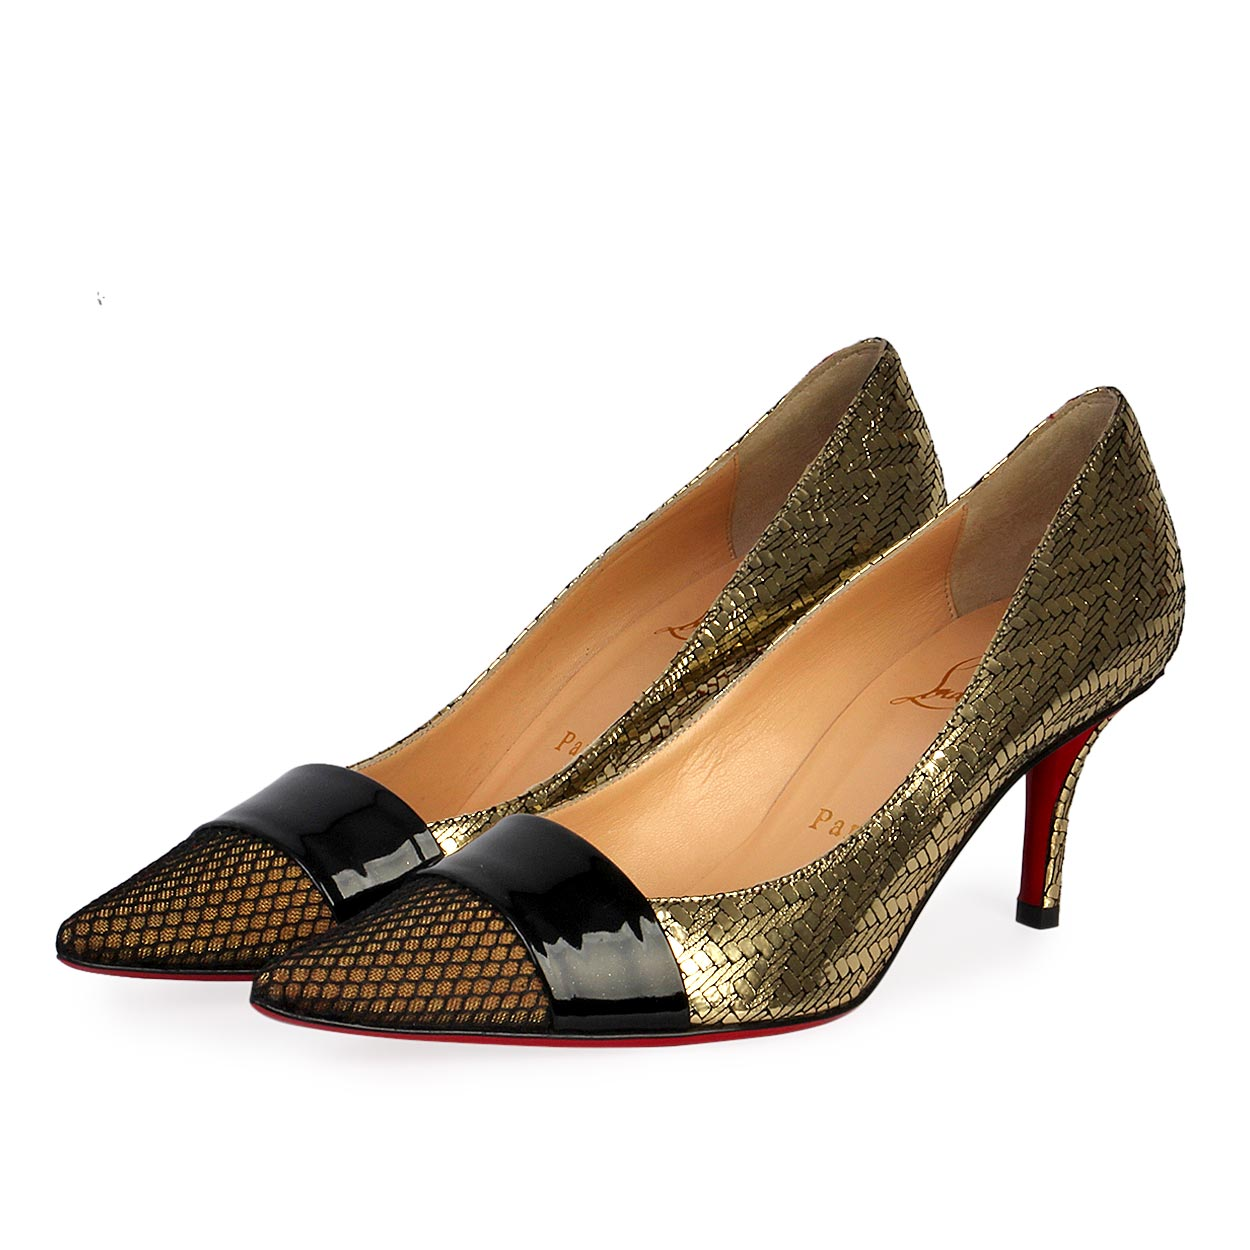 sale retailer aac6e 0edf2 CHRISTIAN LOUBOUTIN Mesh Pointy Toe Pumps Gold/Black - S: 37.5 (4.5)